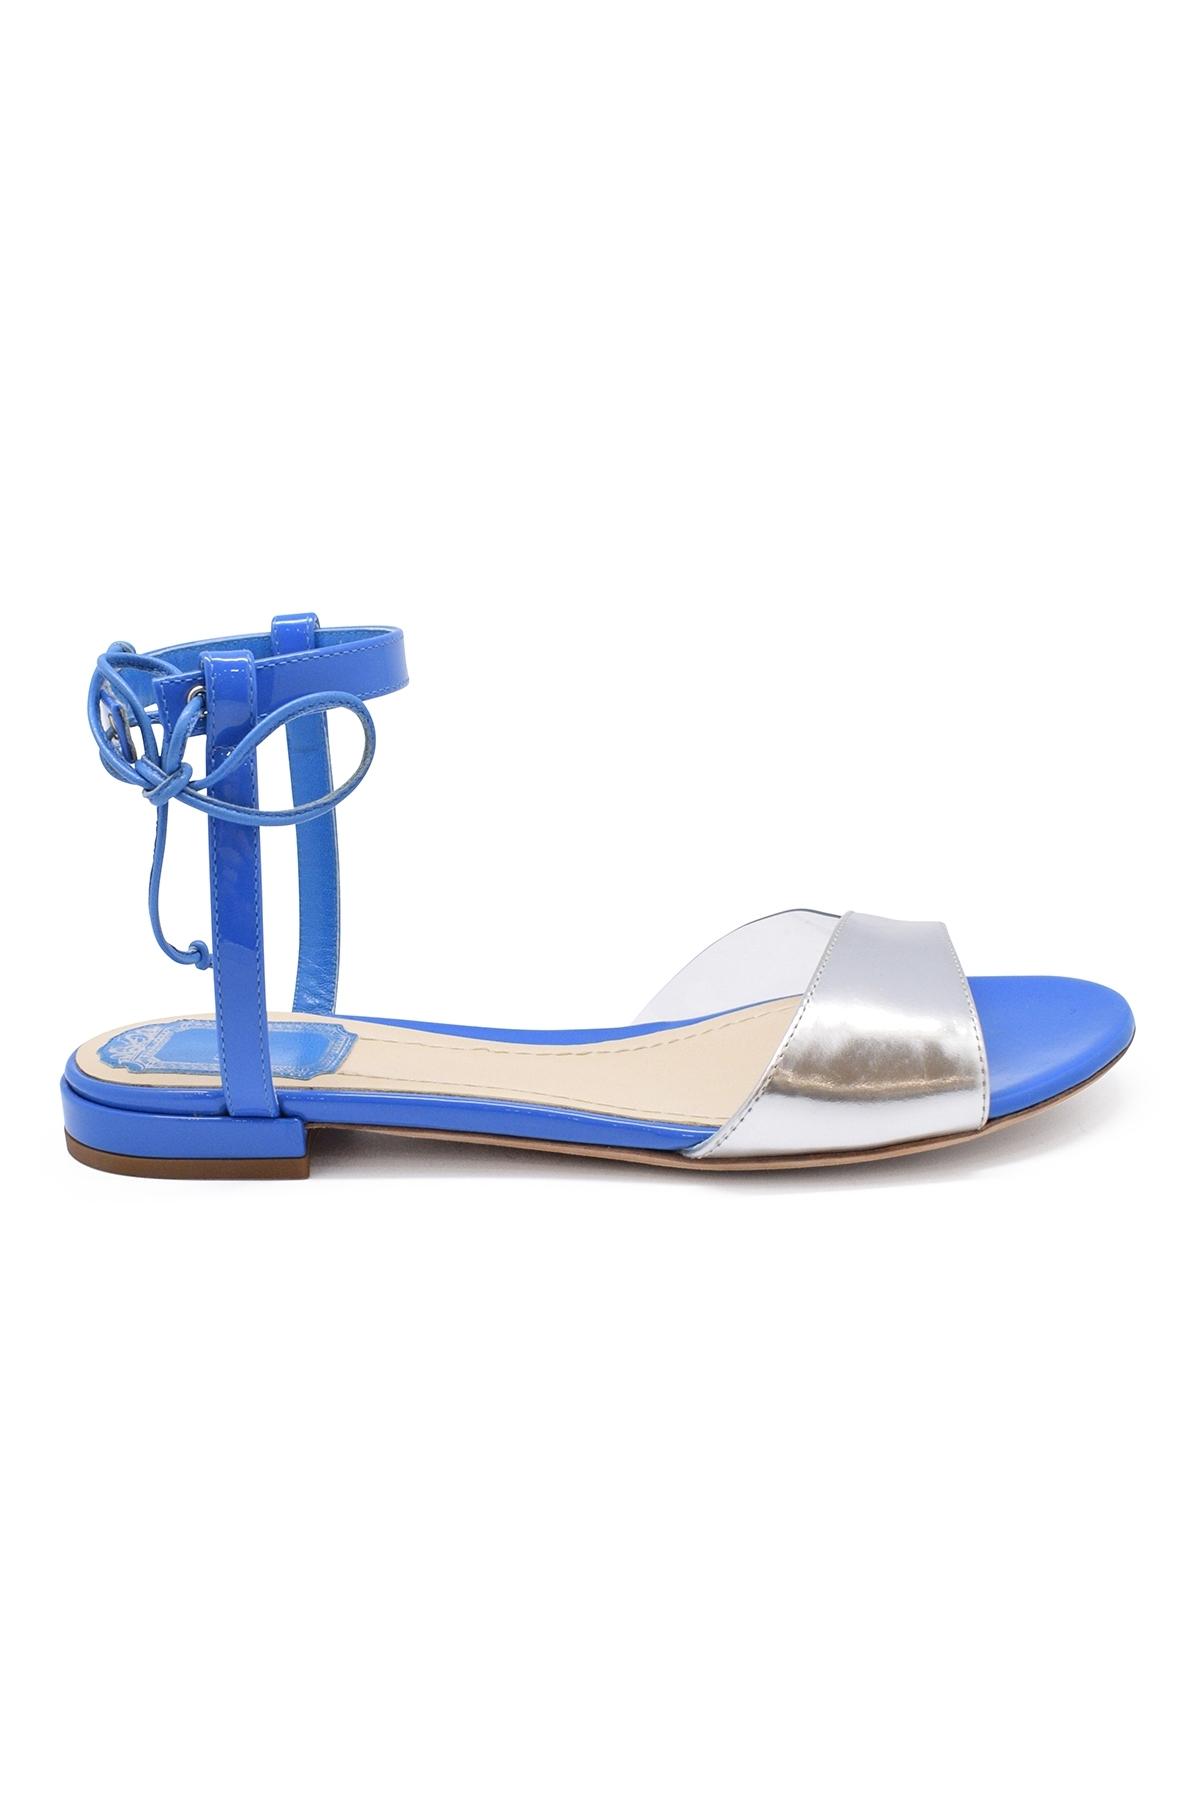 Versatile sandals